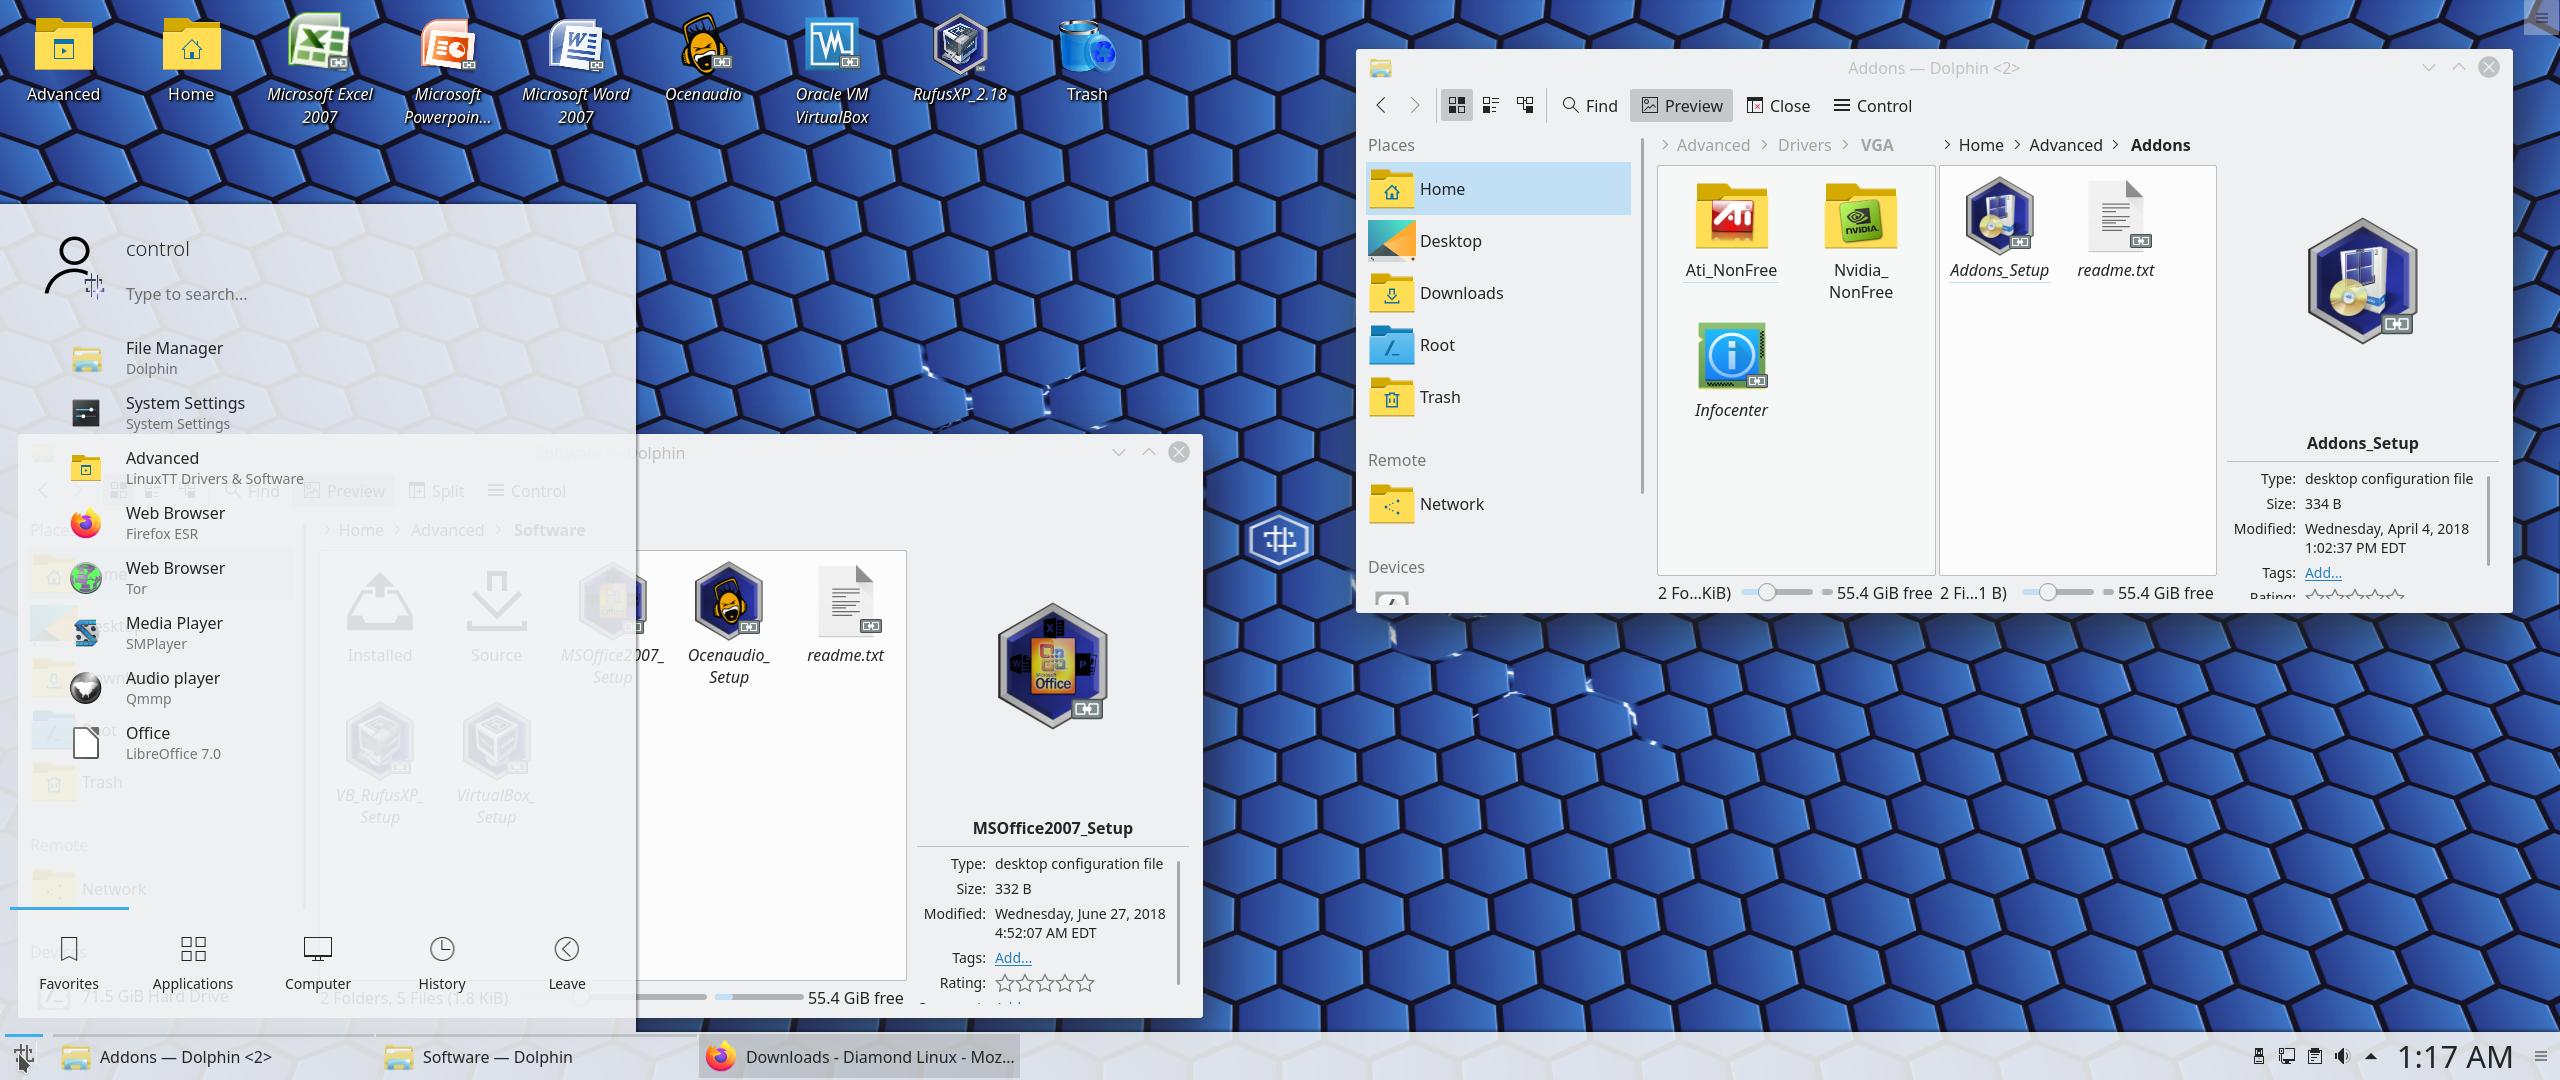 fb61aa28 6db4 6810 4ed9 cfa3e955077d - Diamond Linux-TT easy Linux for Windows users